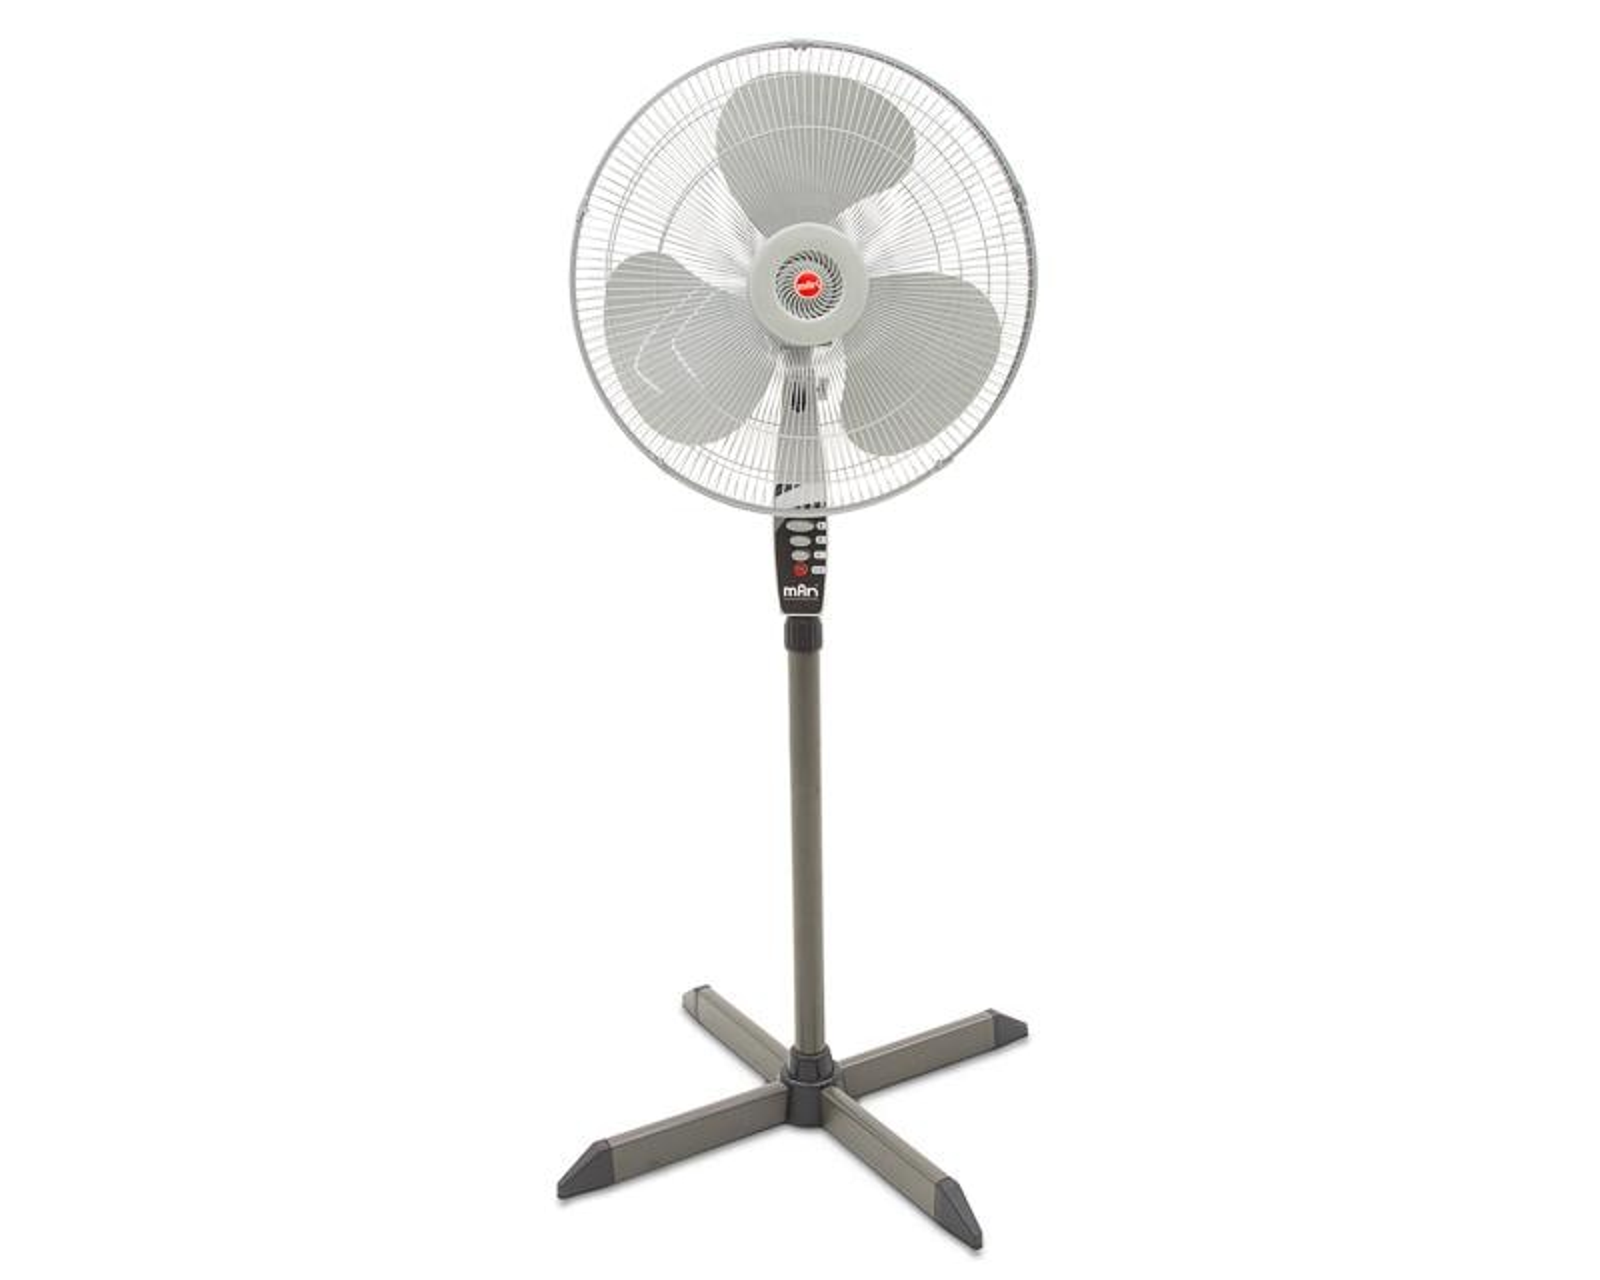 Ventilador de Pedestal mAn de 3 Velocidades